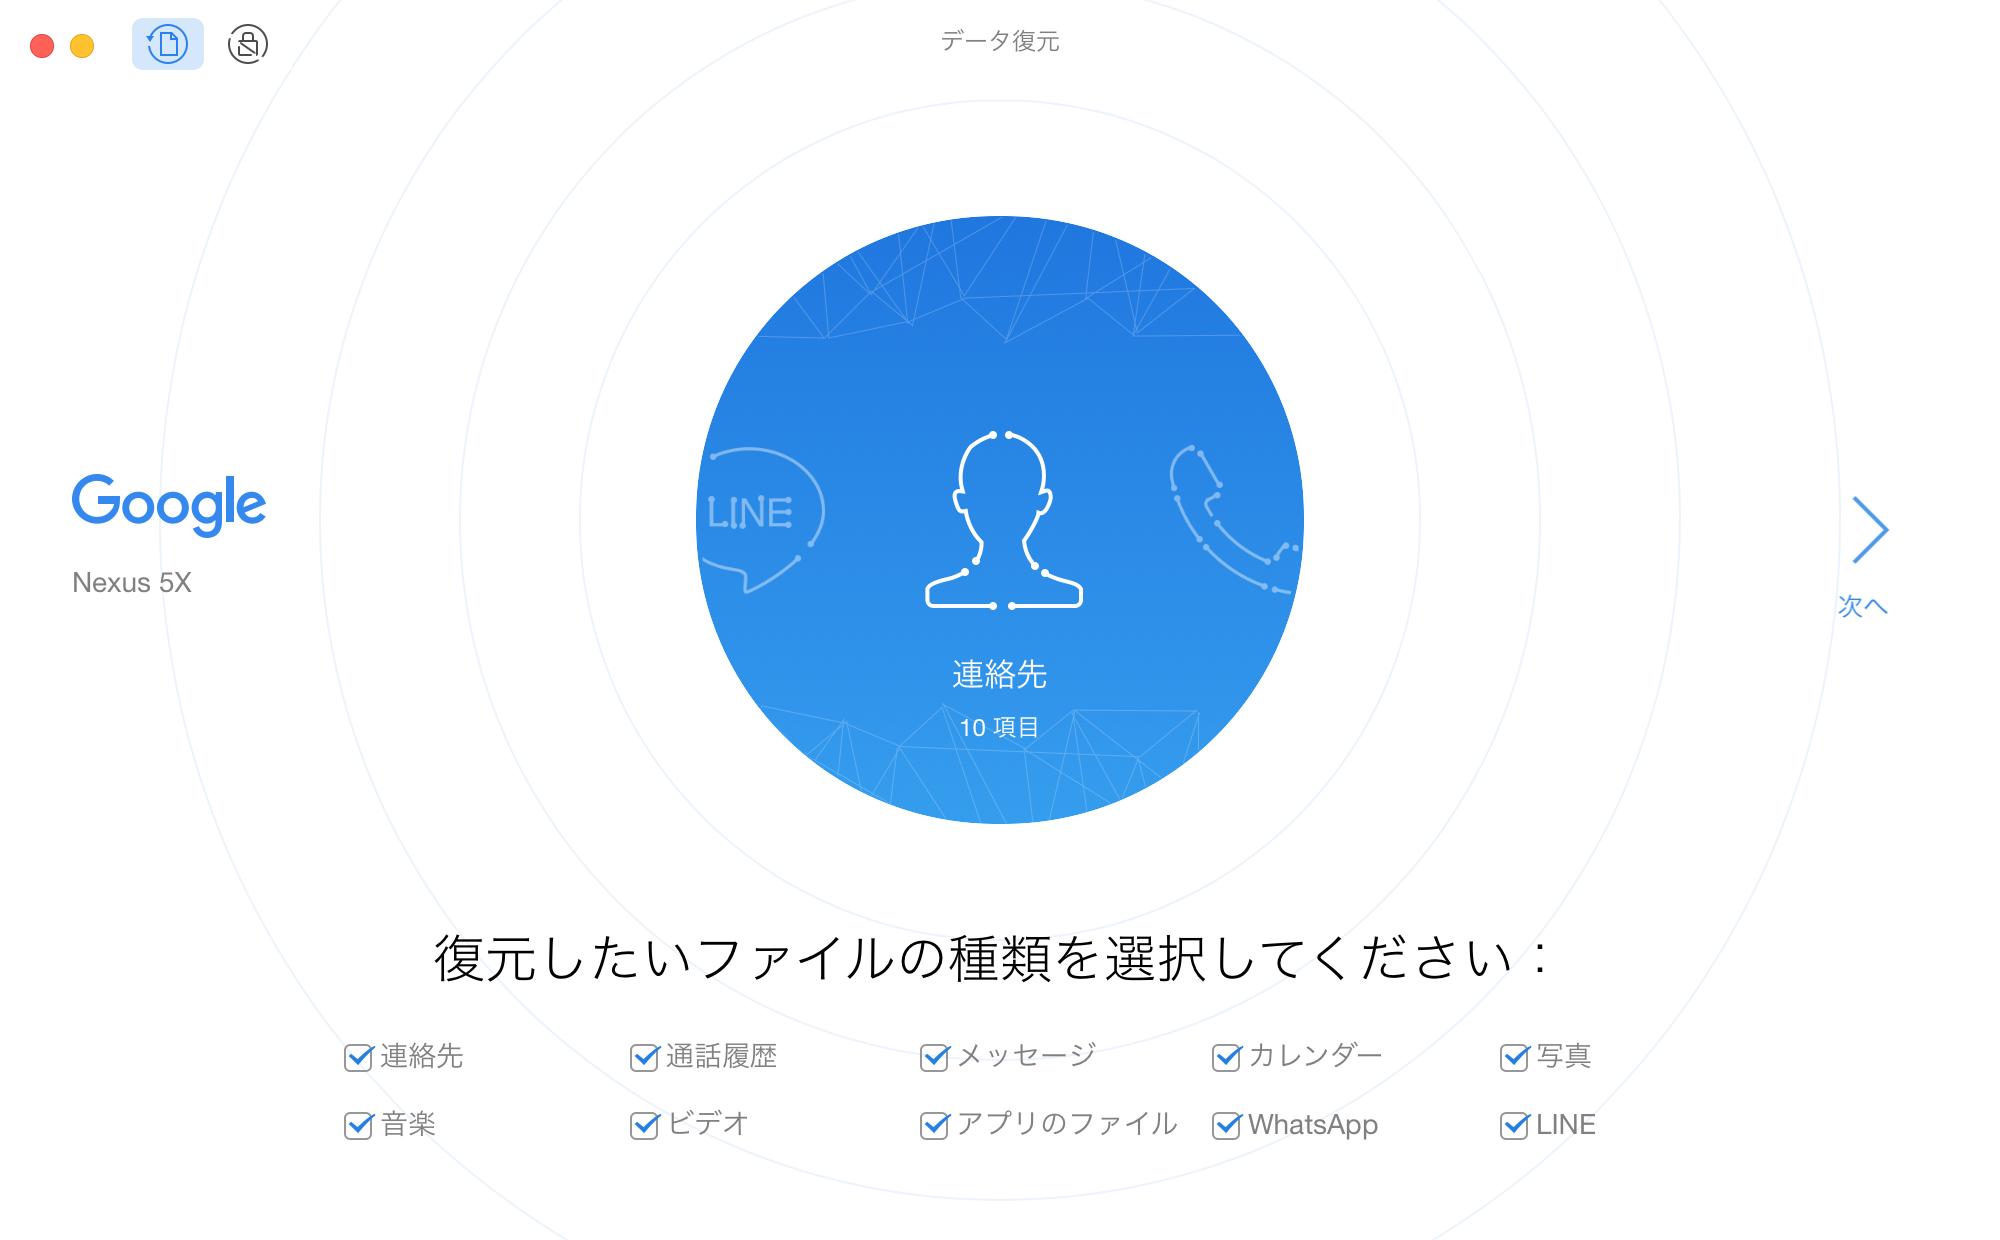 PhoneRescue - Googleデータ復元のメインインターフェイス